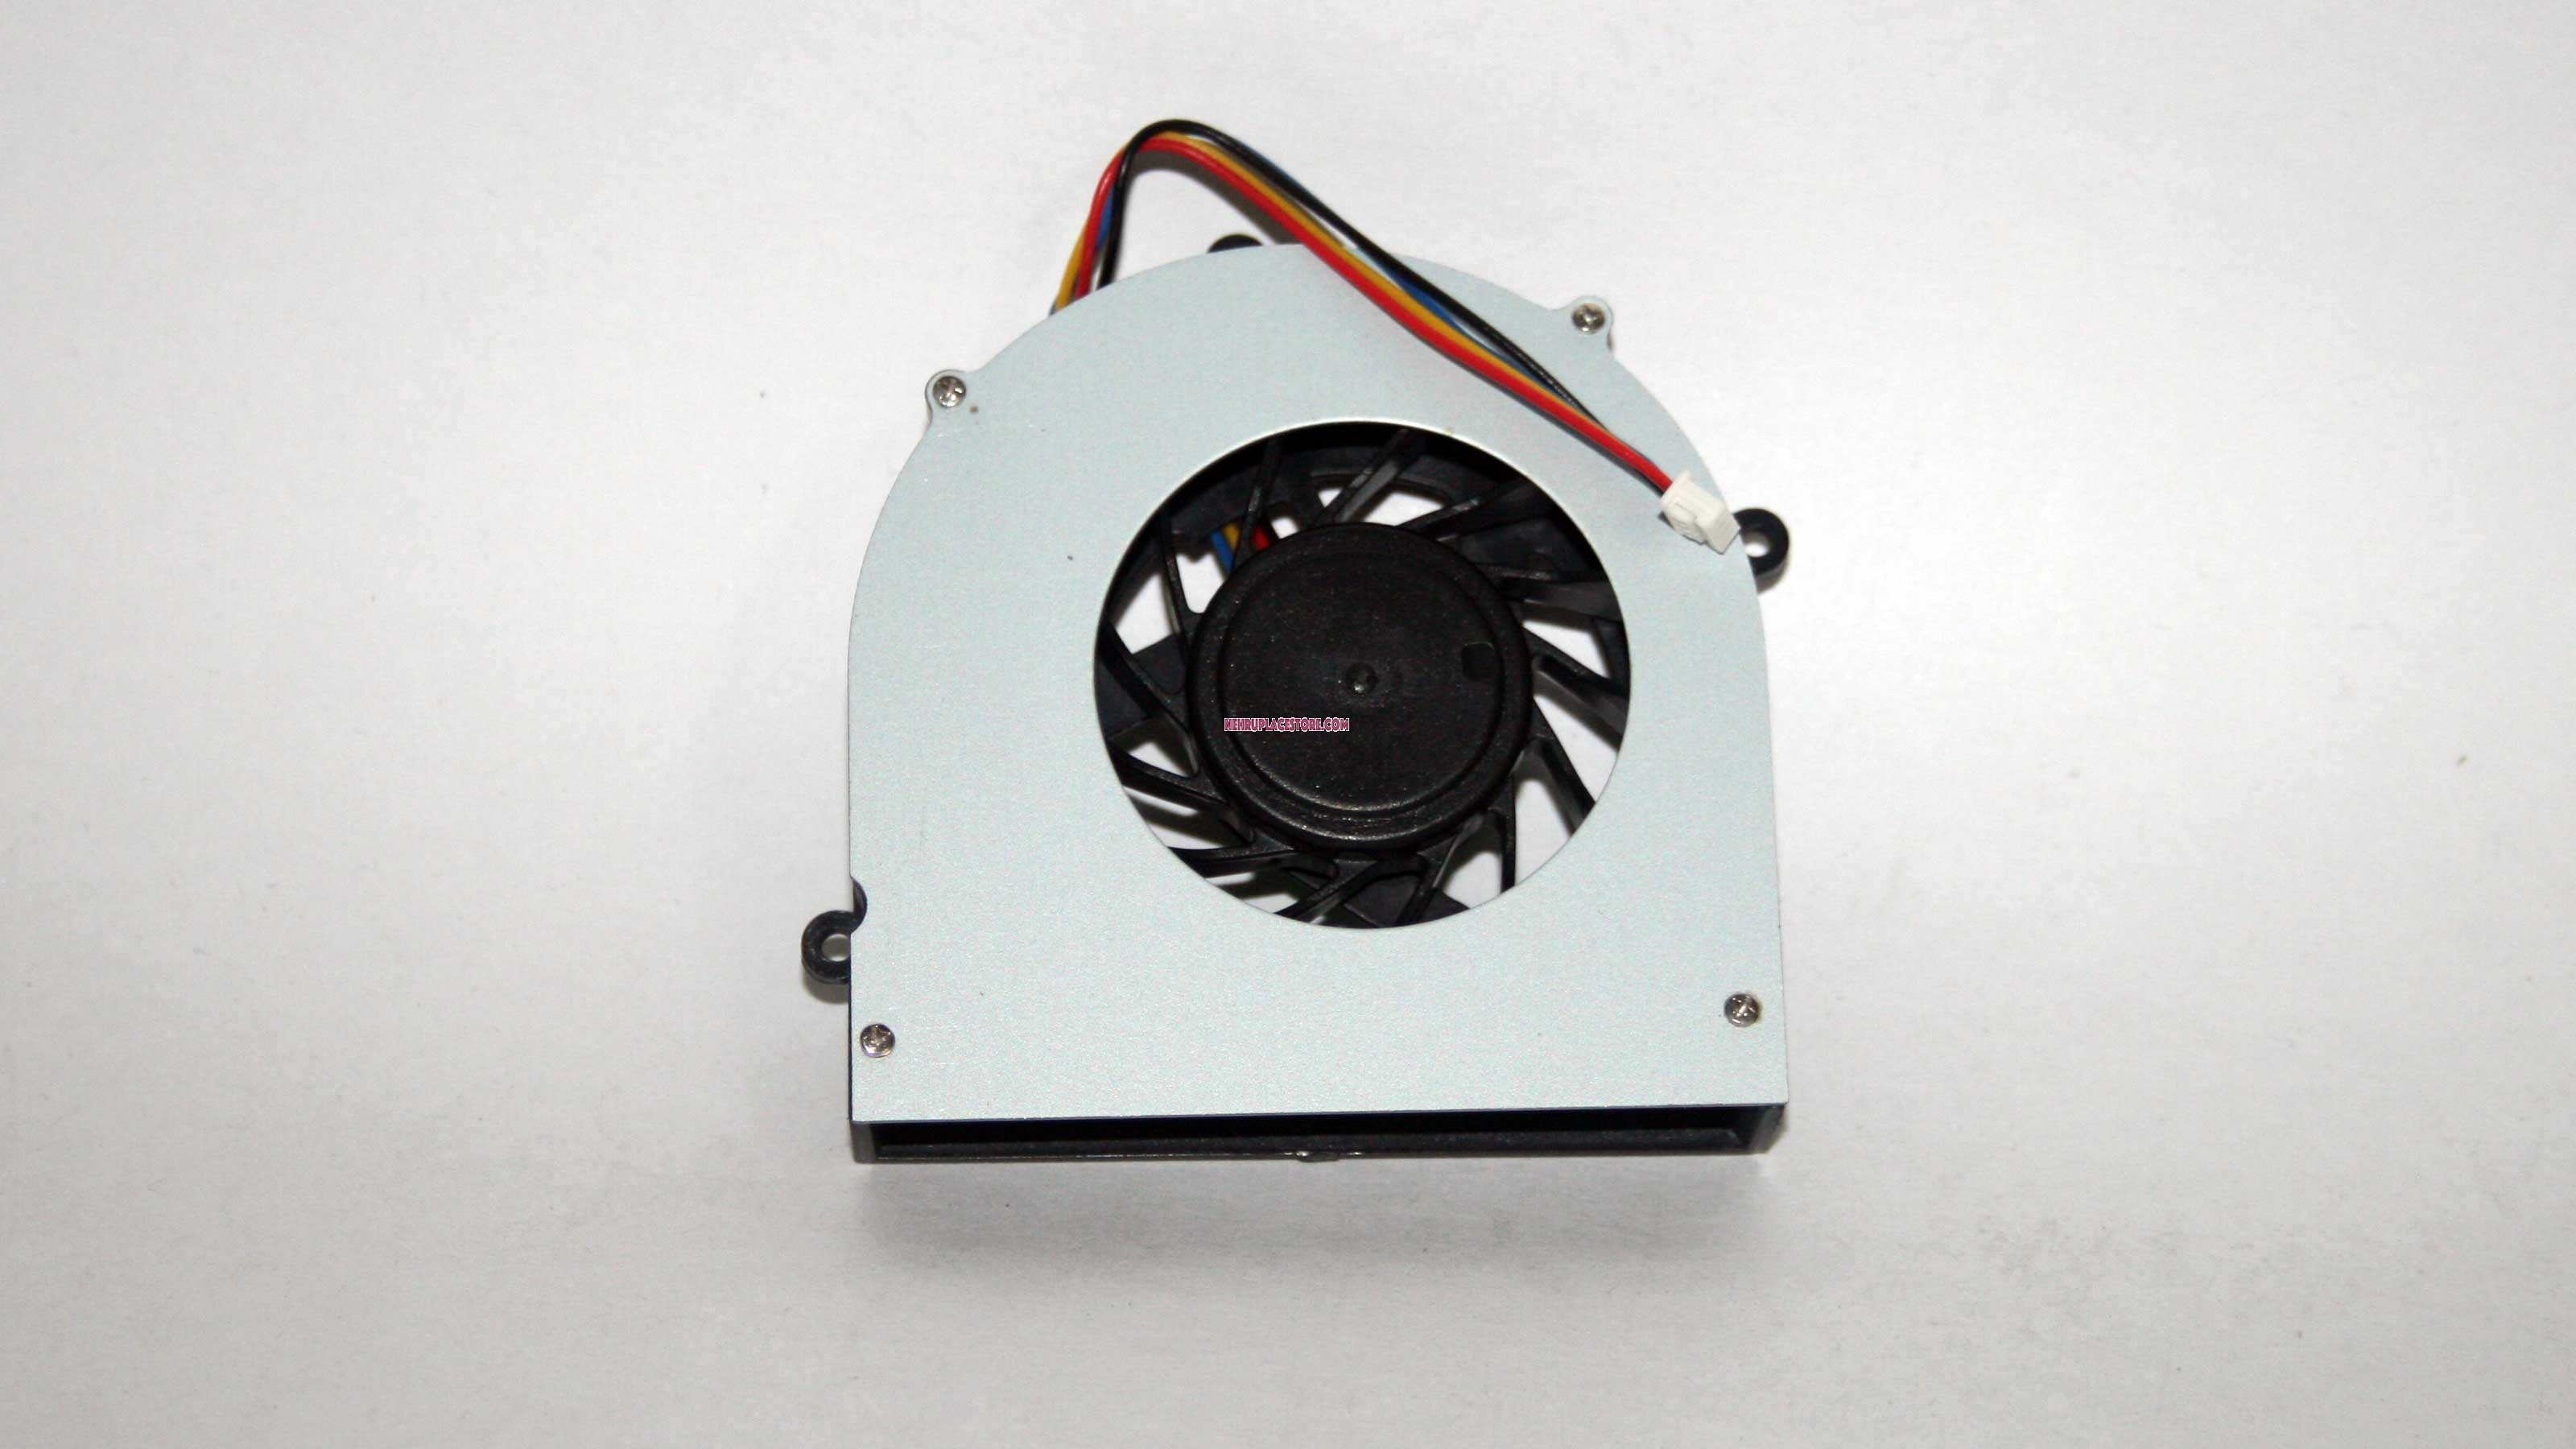 Lenovo G470 G470a G475 G570 G575 Laptop Cpu Cooling Fan